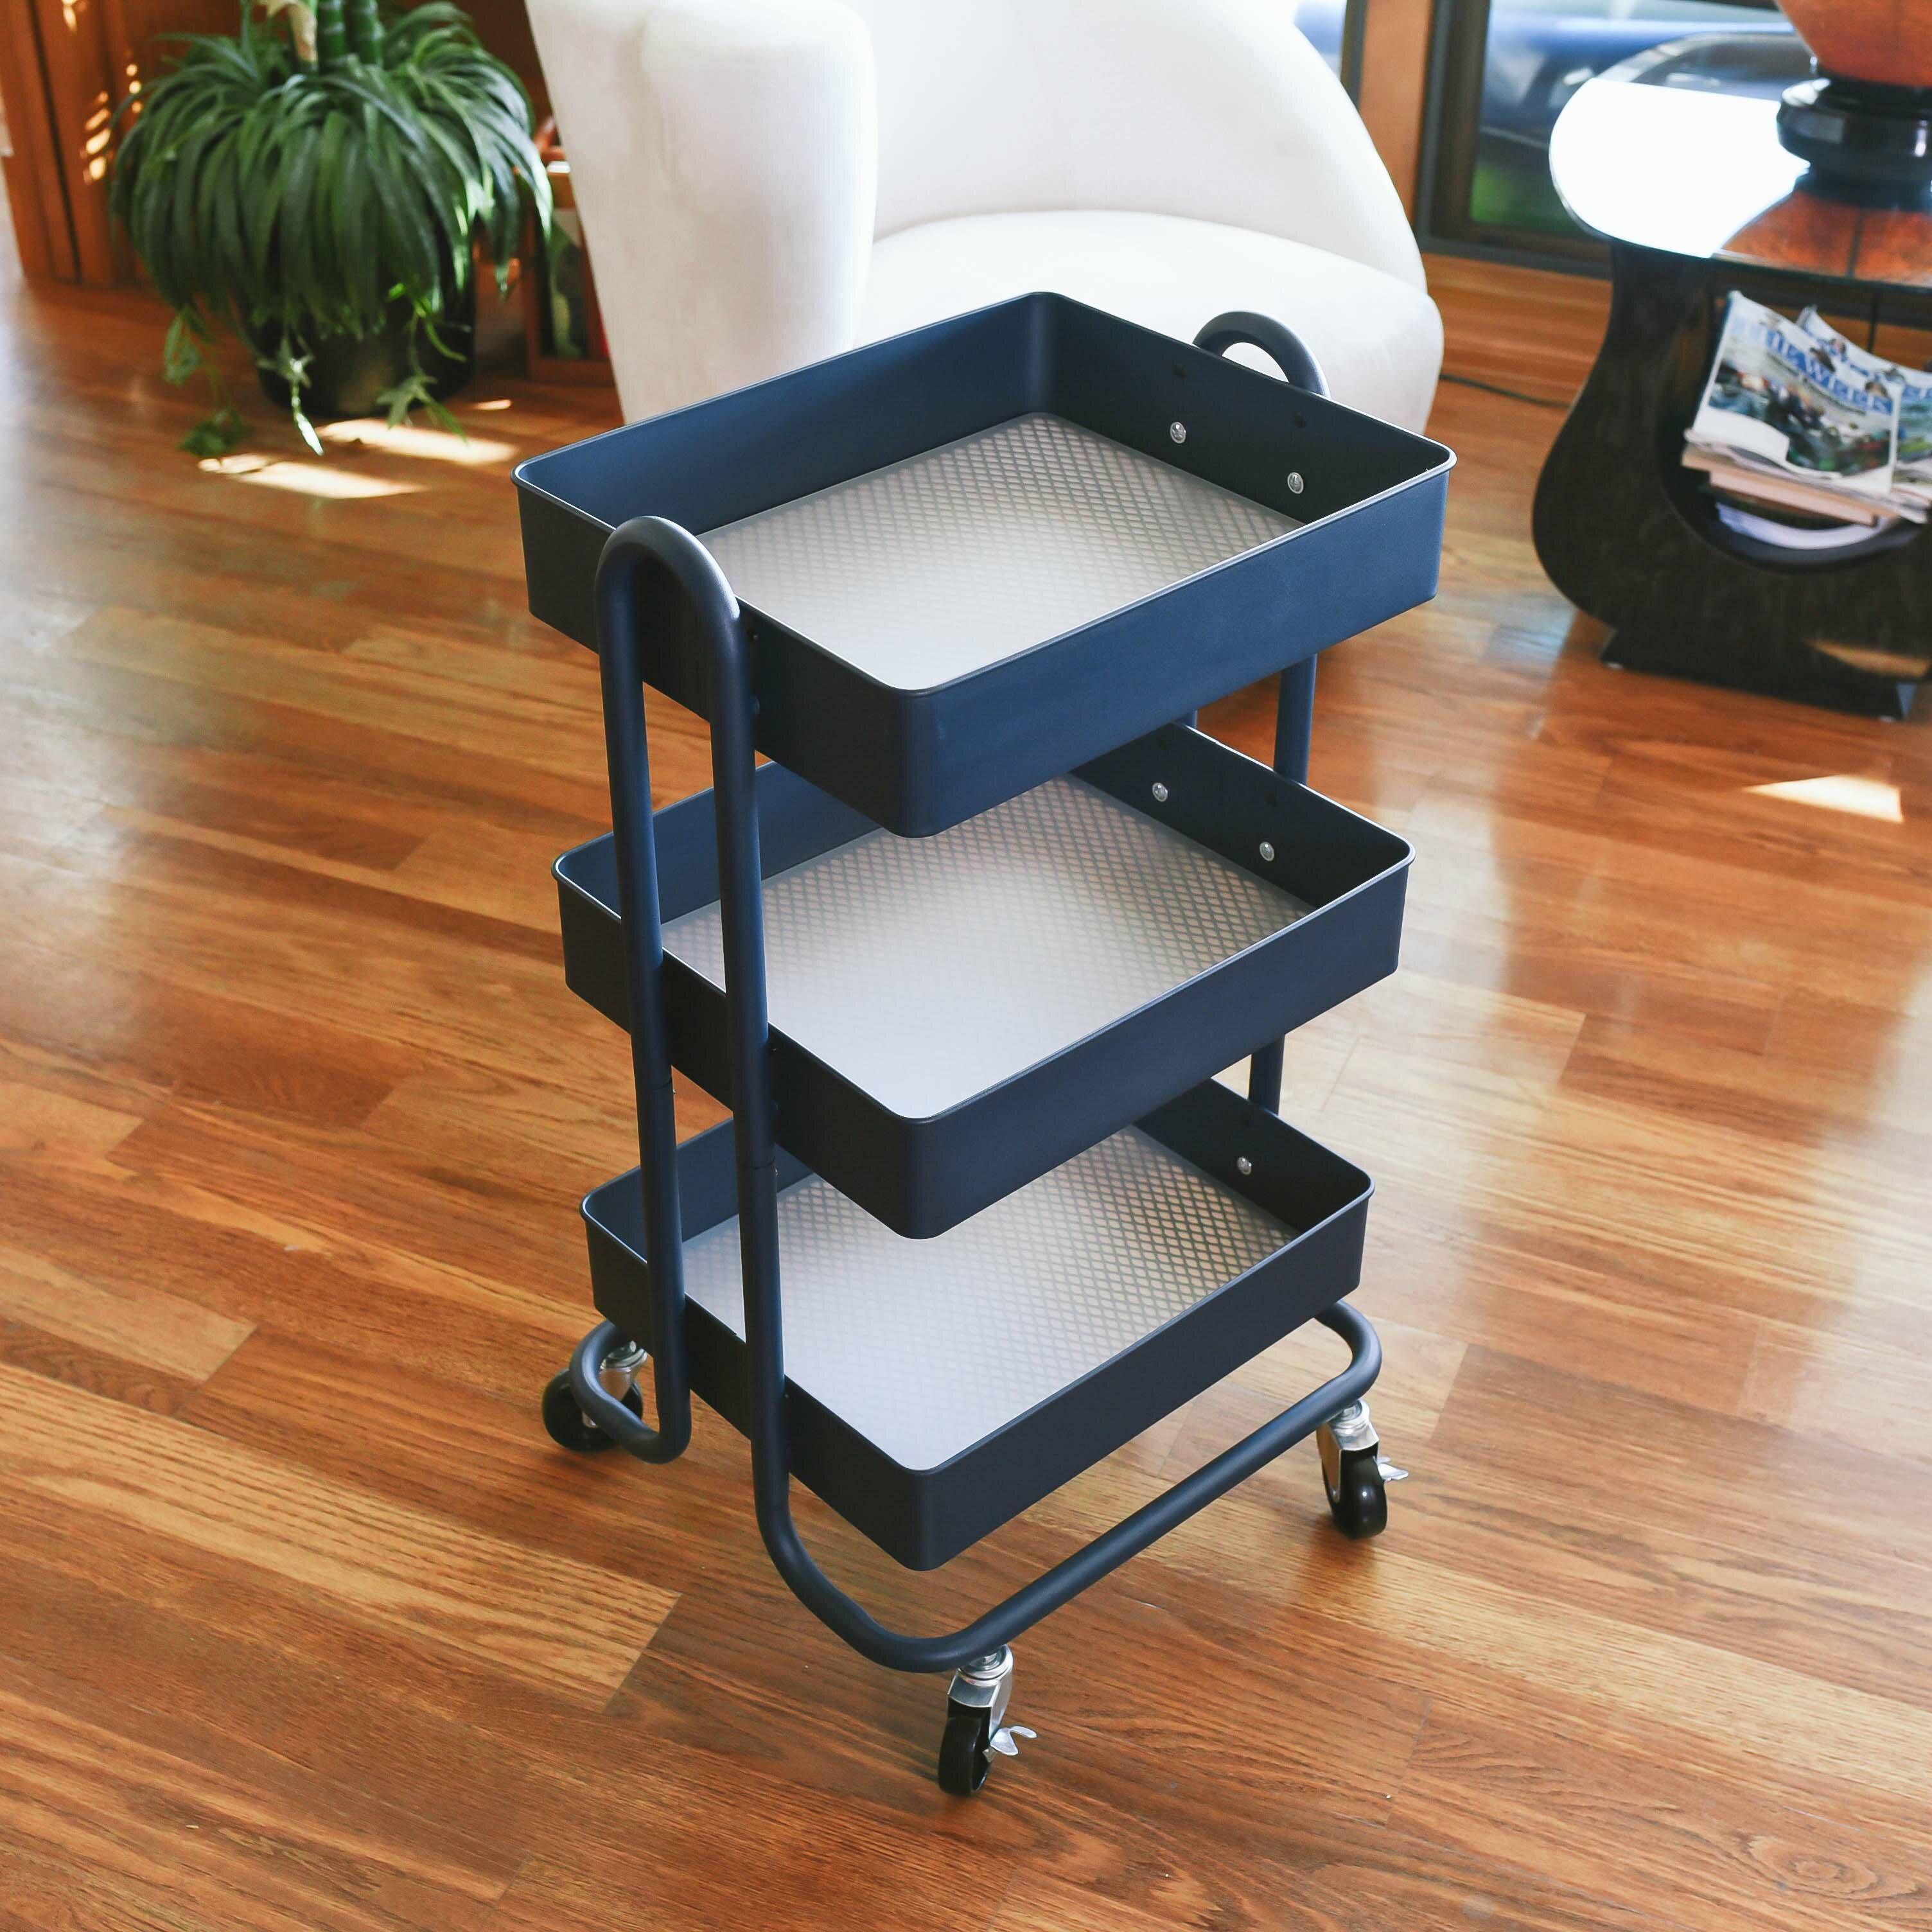 20f08cbf53b2 3 Tier Utility Rolling Cart